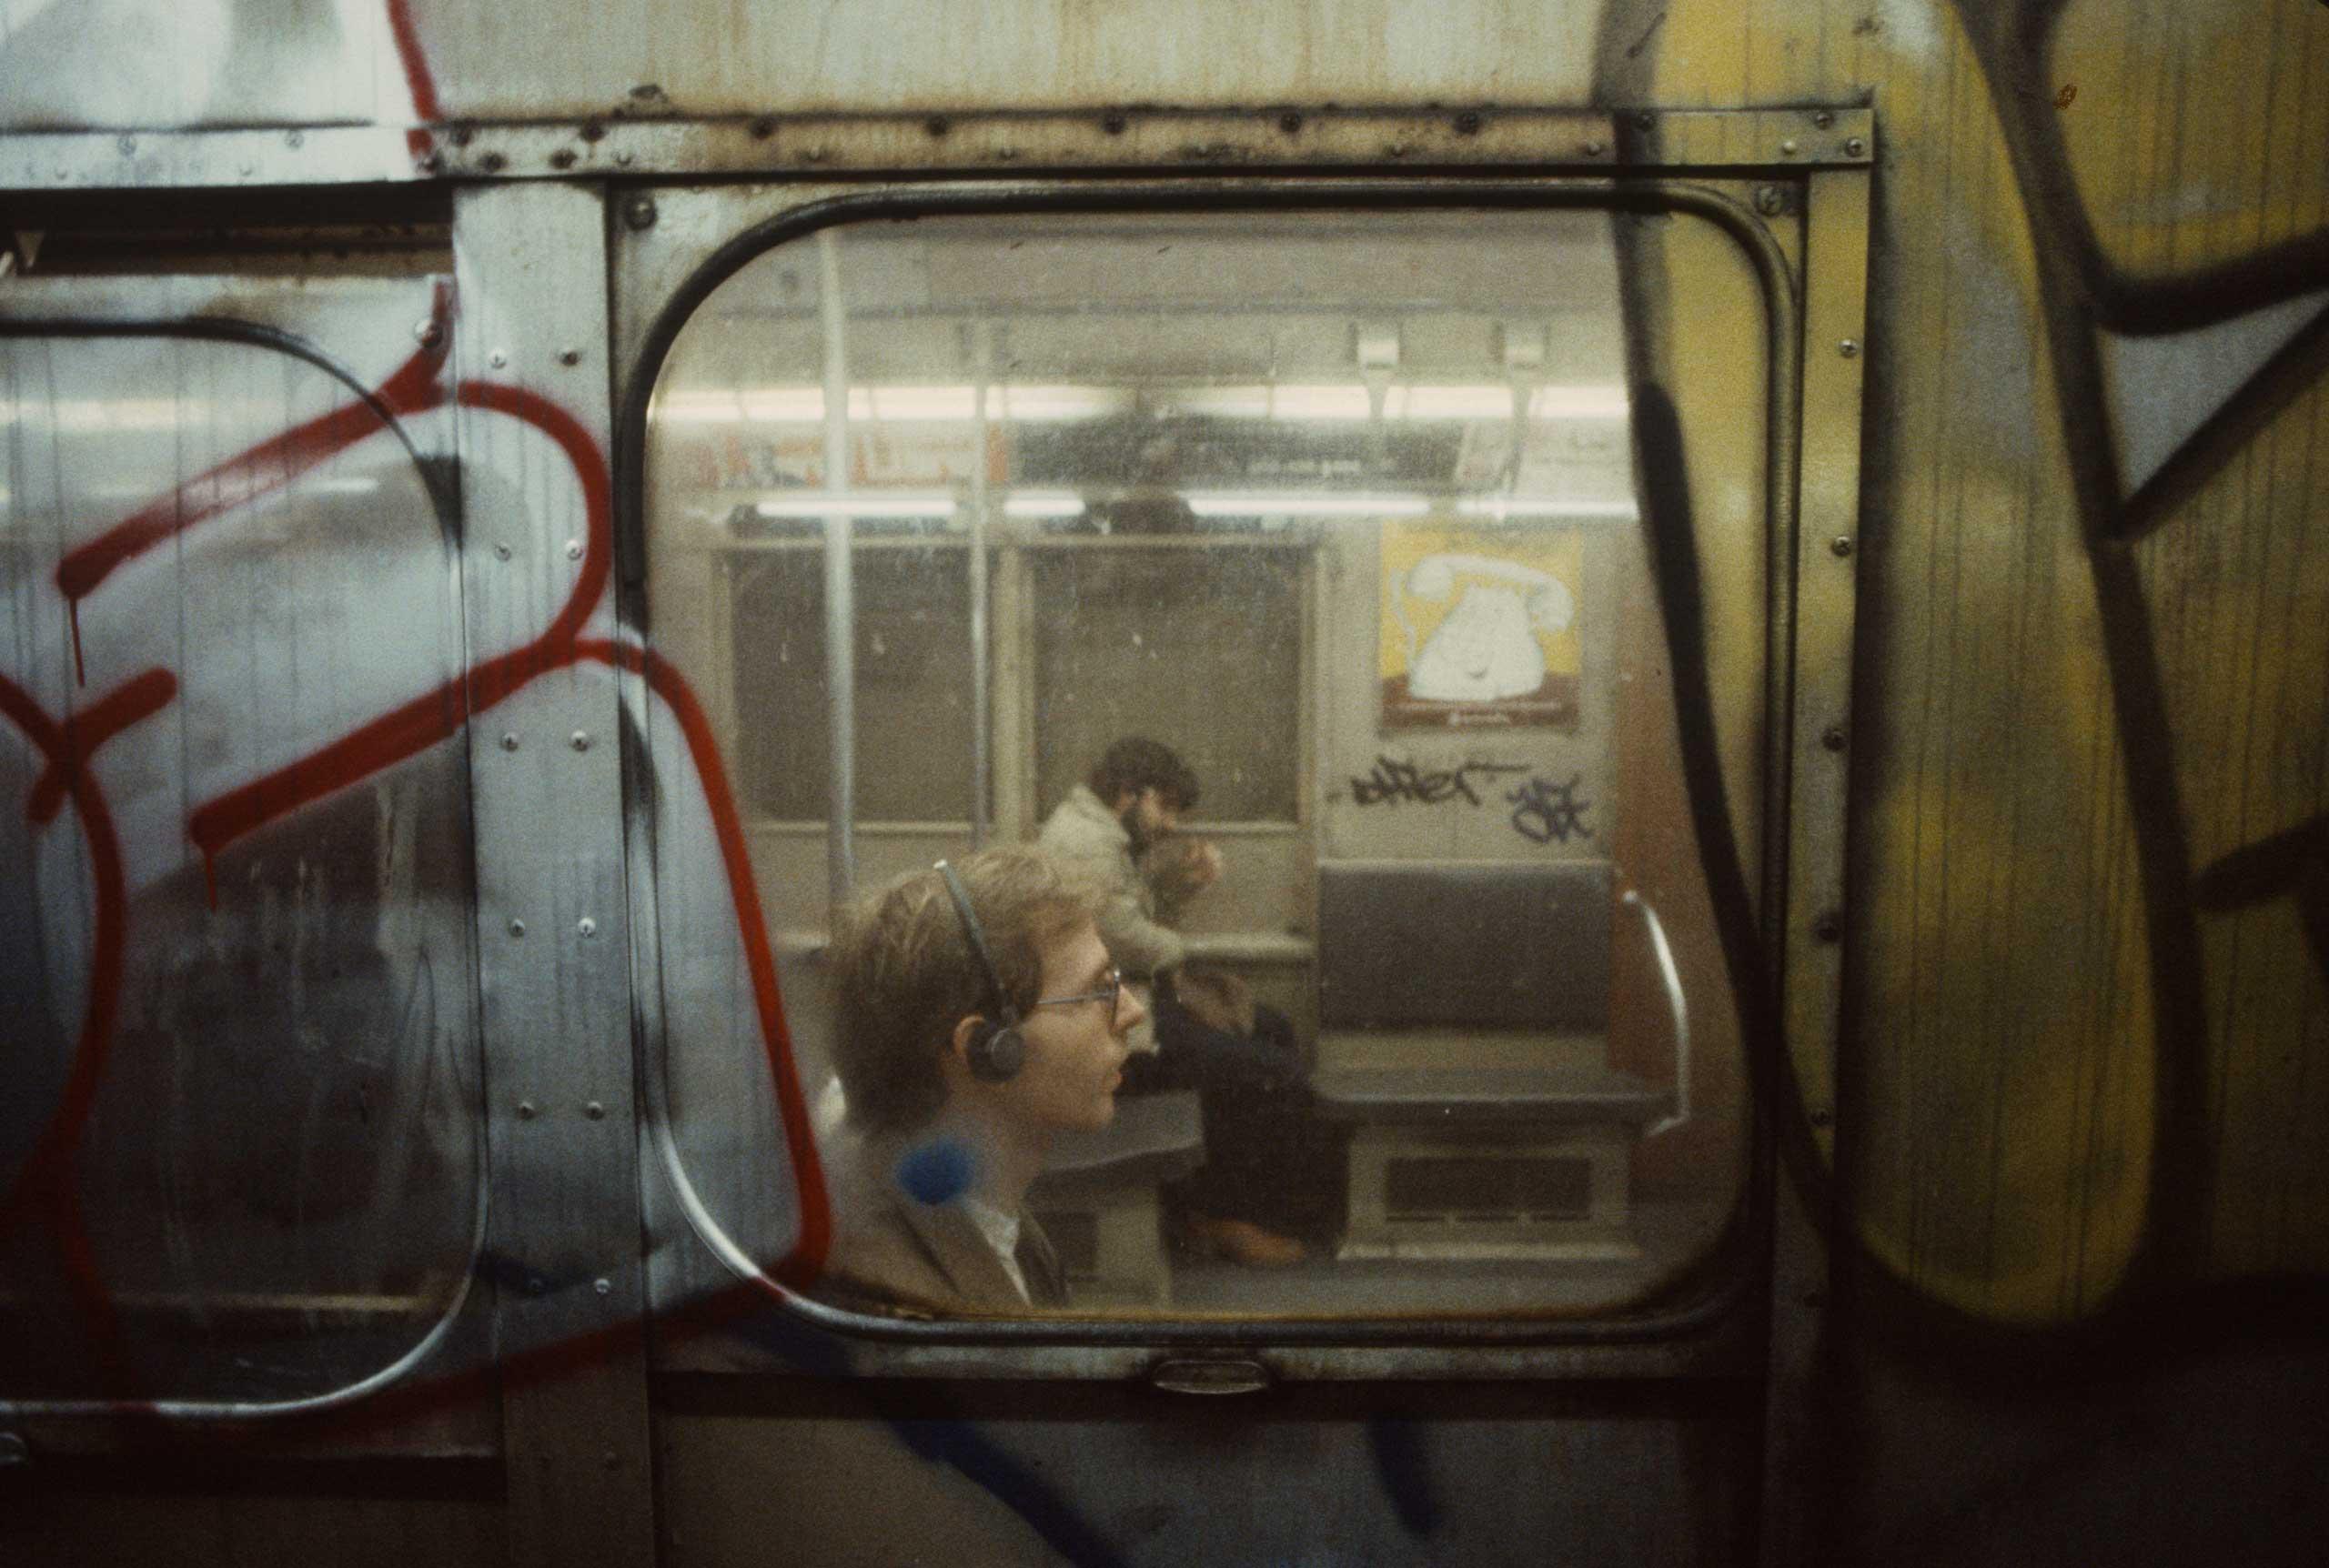 A man is seen wearing headphones through a subway car window, 1981.